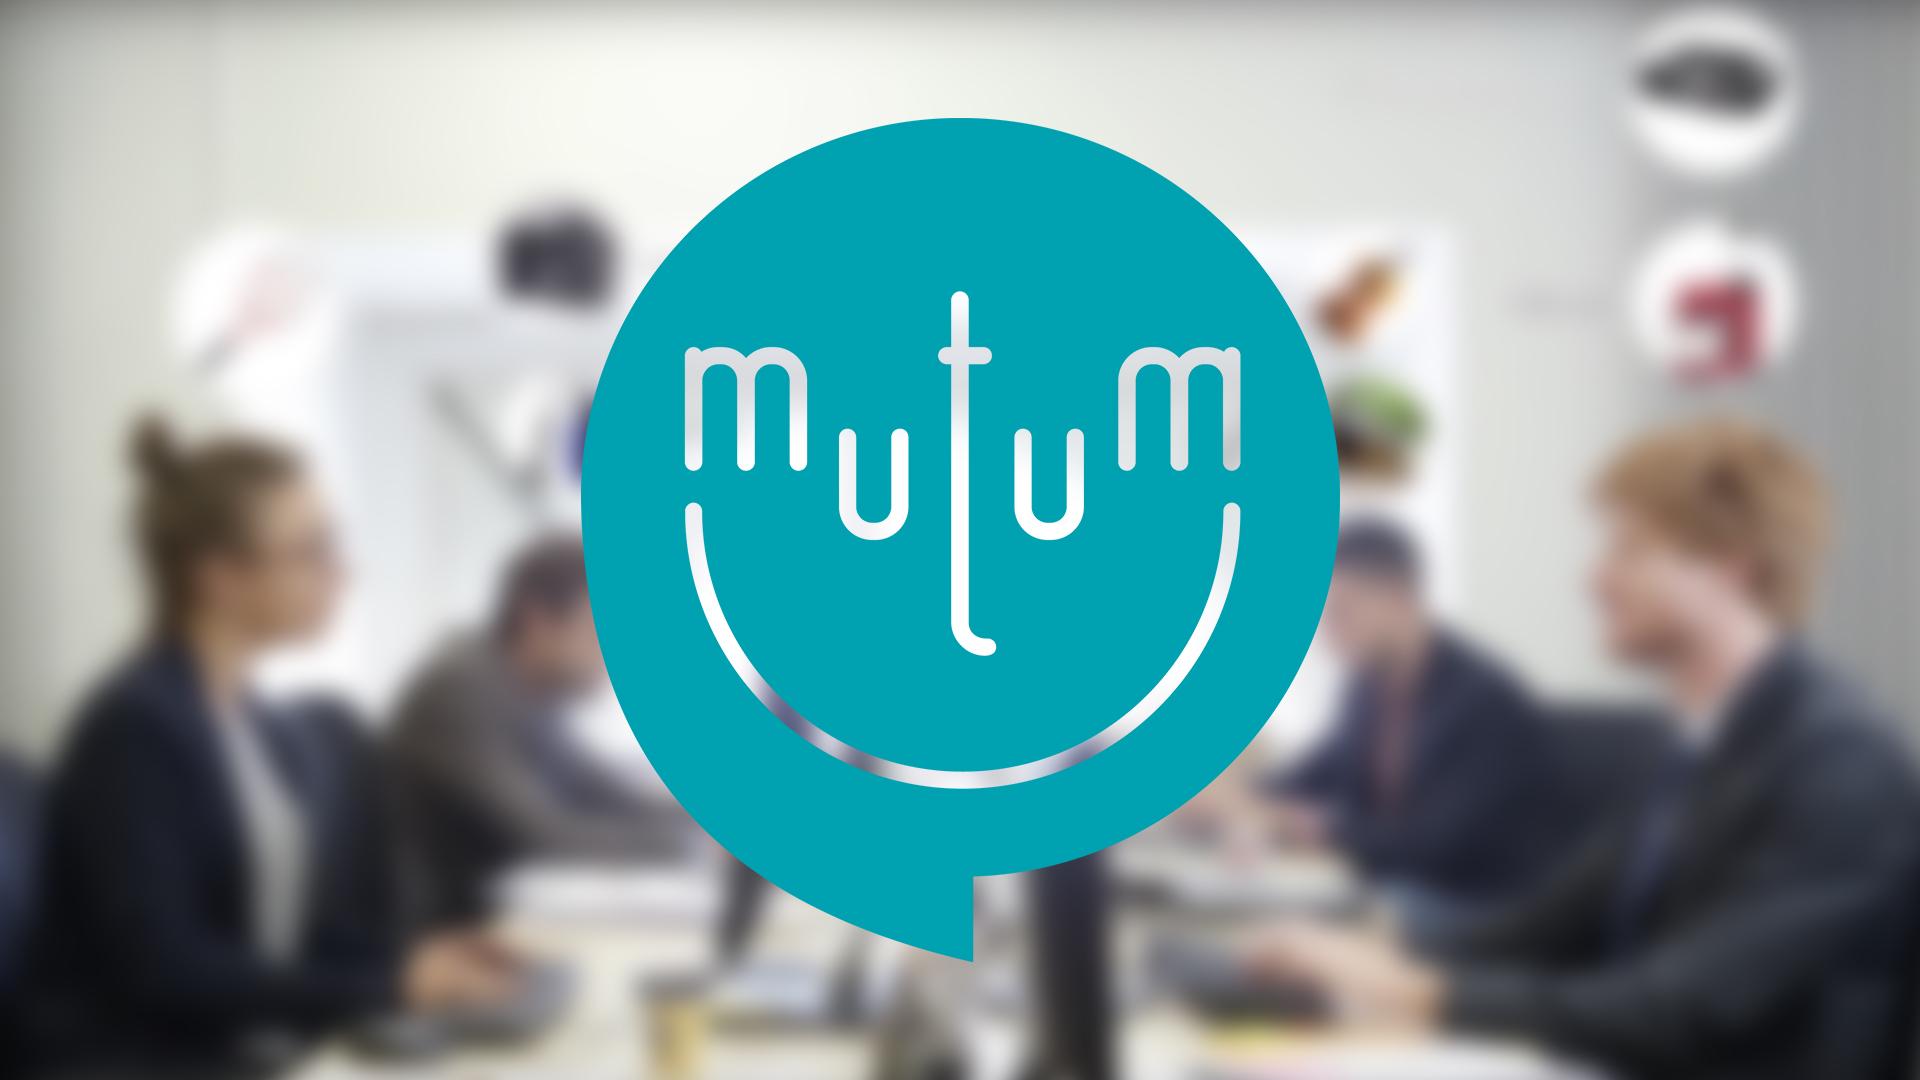 Mutum - Vidéo co